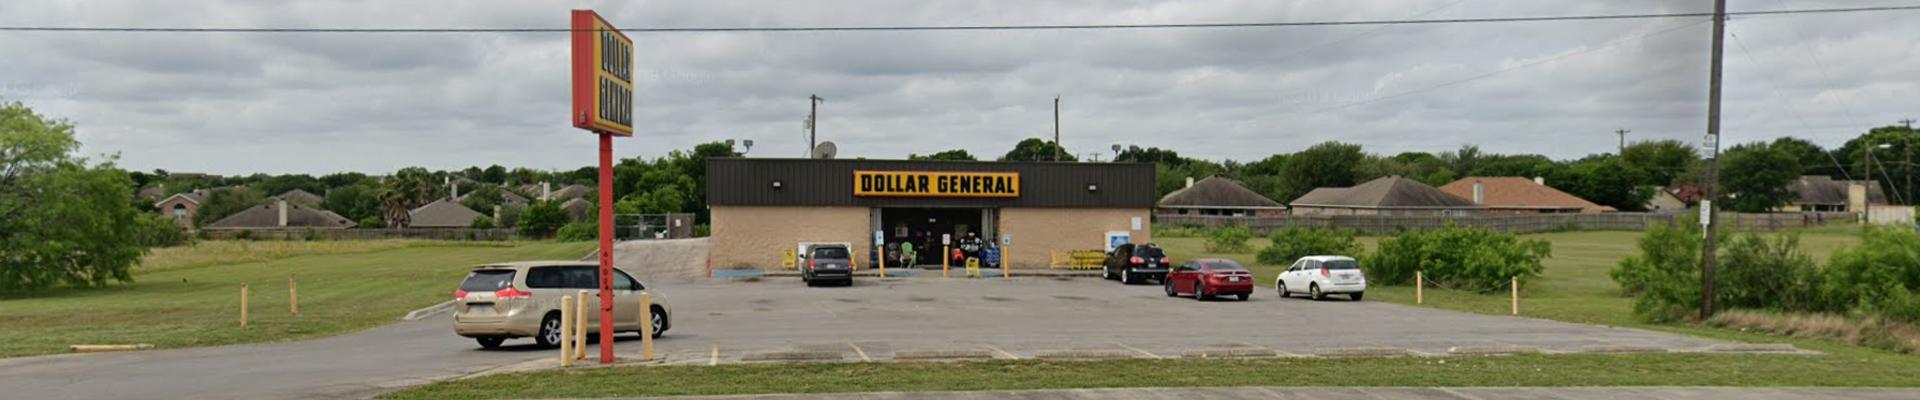 Dollar General (7504) - China Grove, Texas